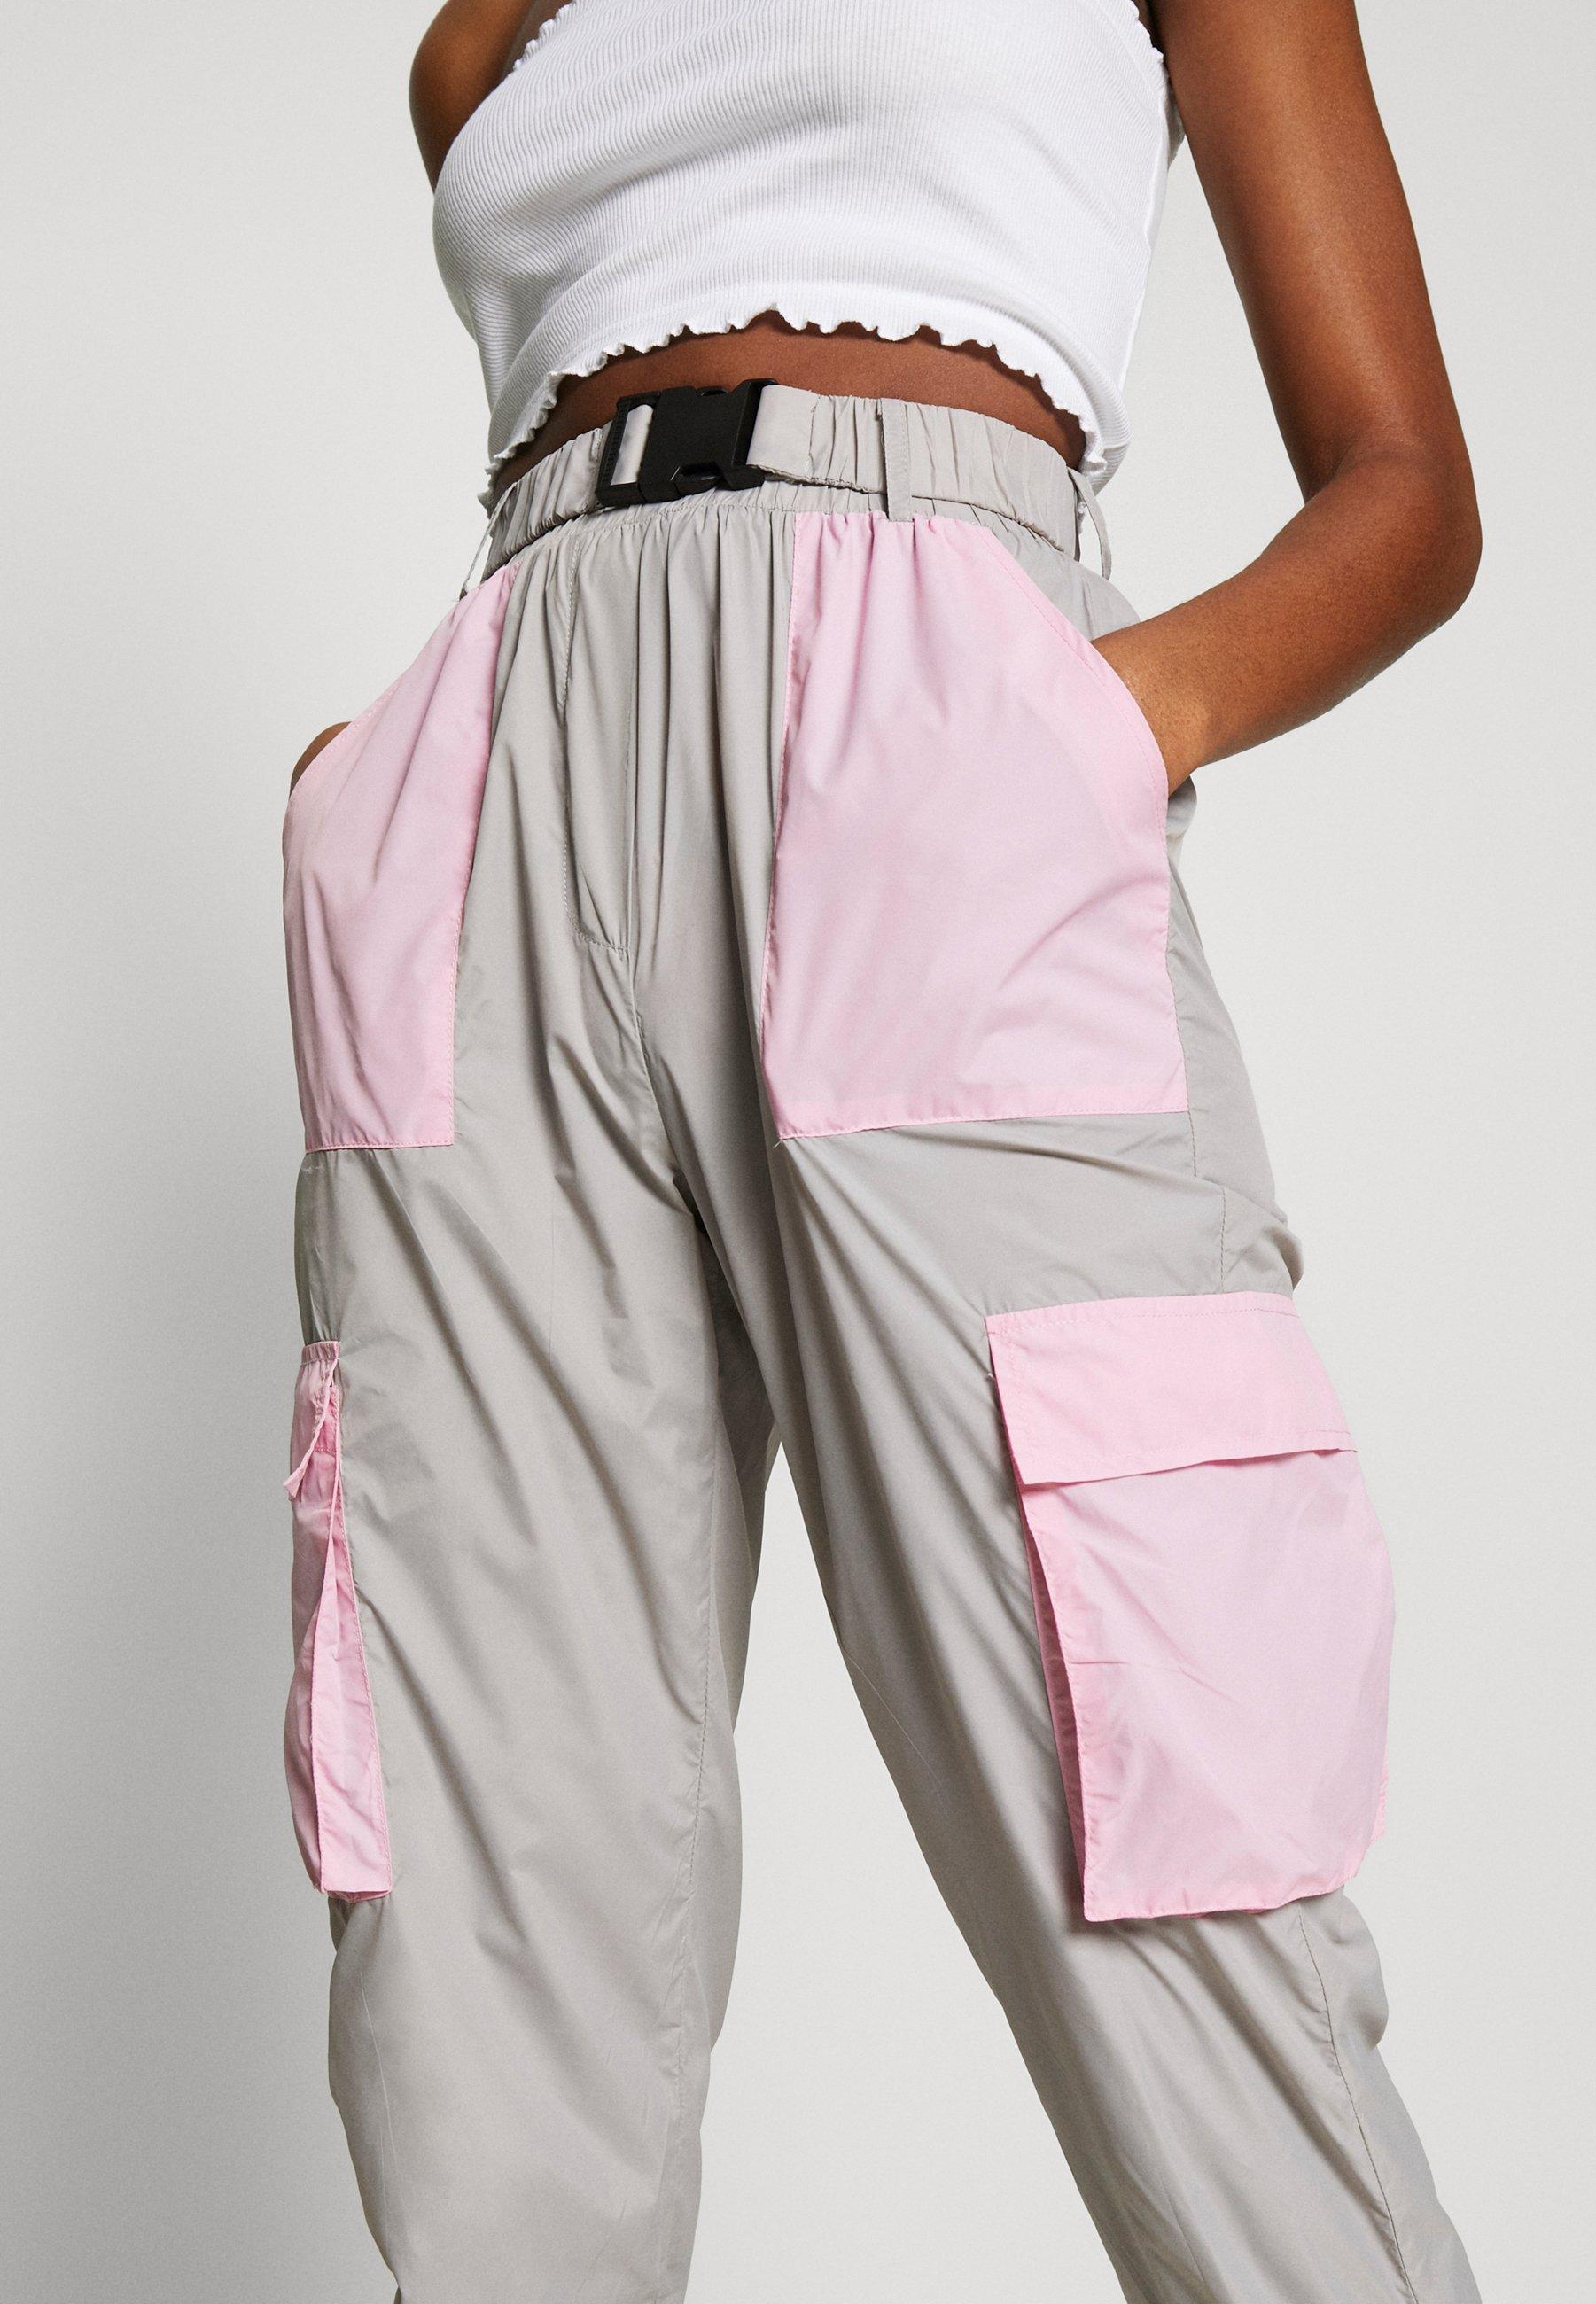 Missguided CODE CREATE BUCKLE BELT TRACKSUIT BOTTOMS - Spodnie treningowe - grey/pink